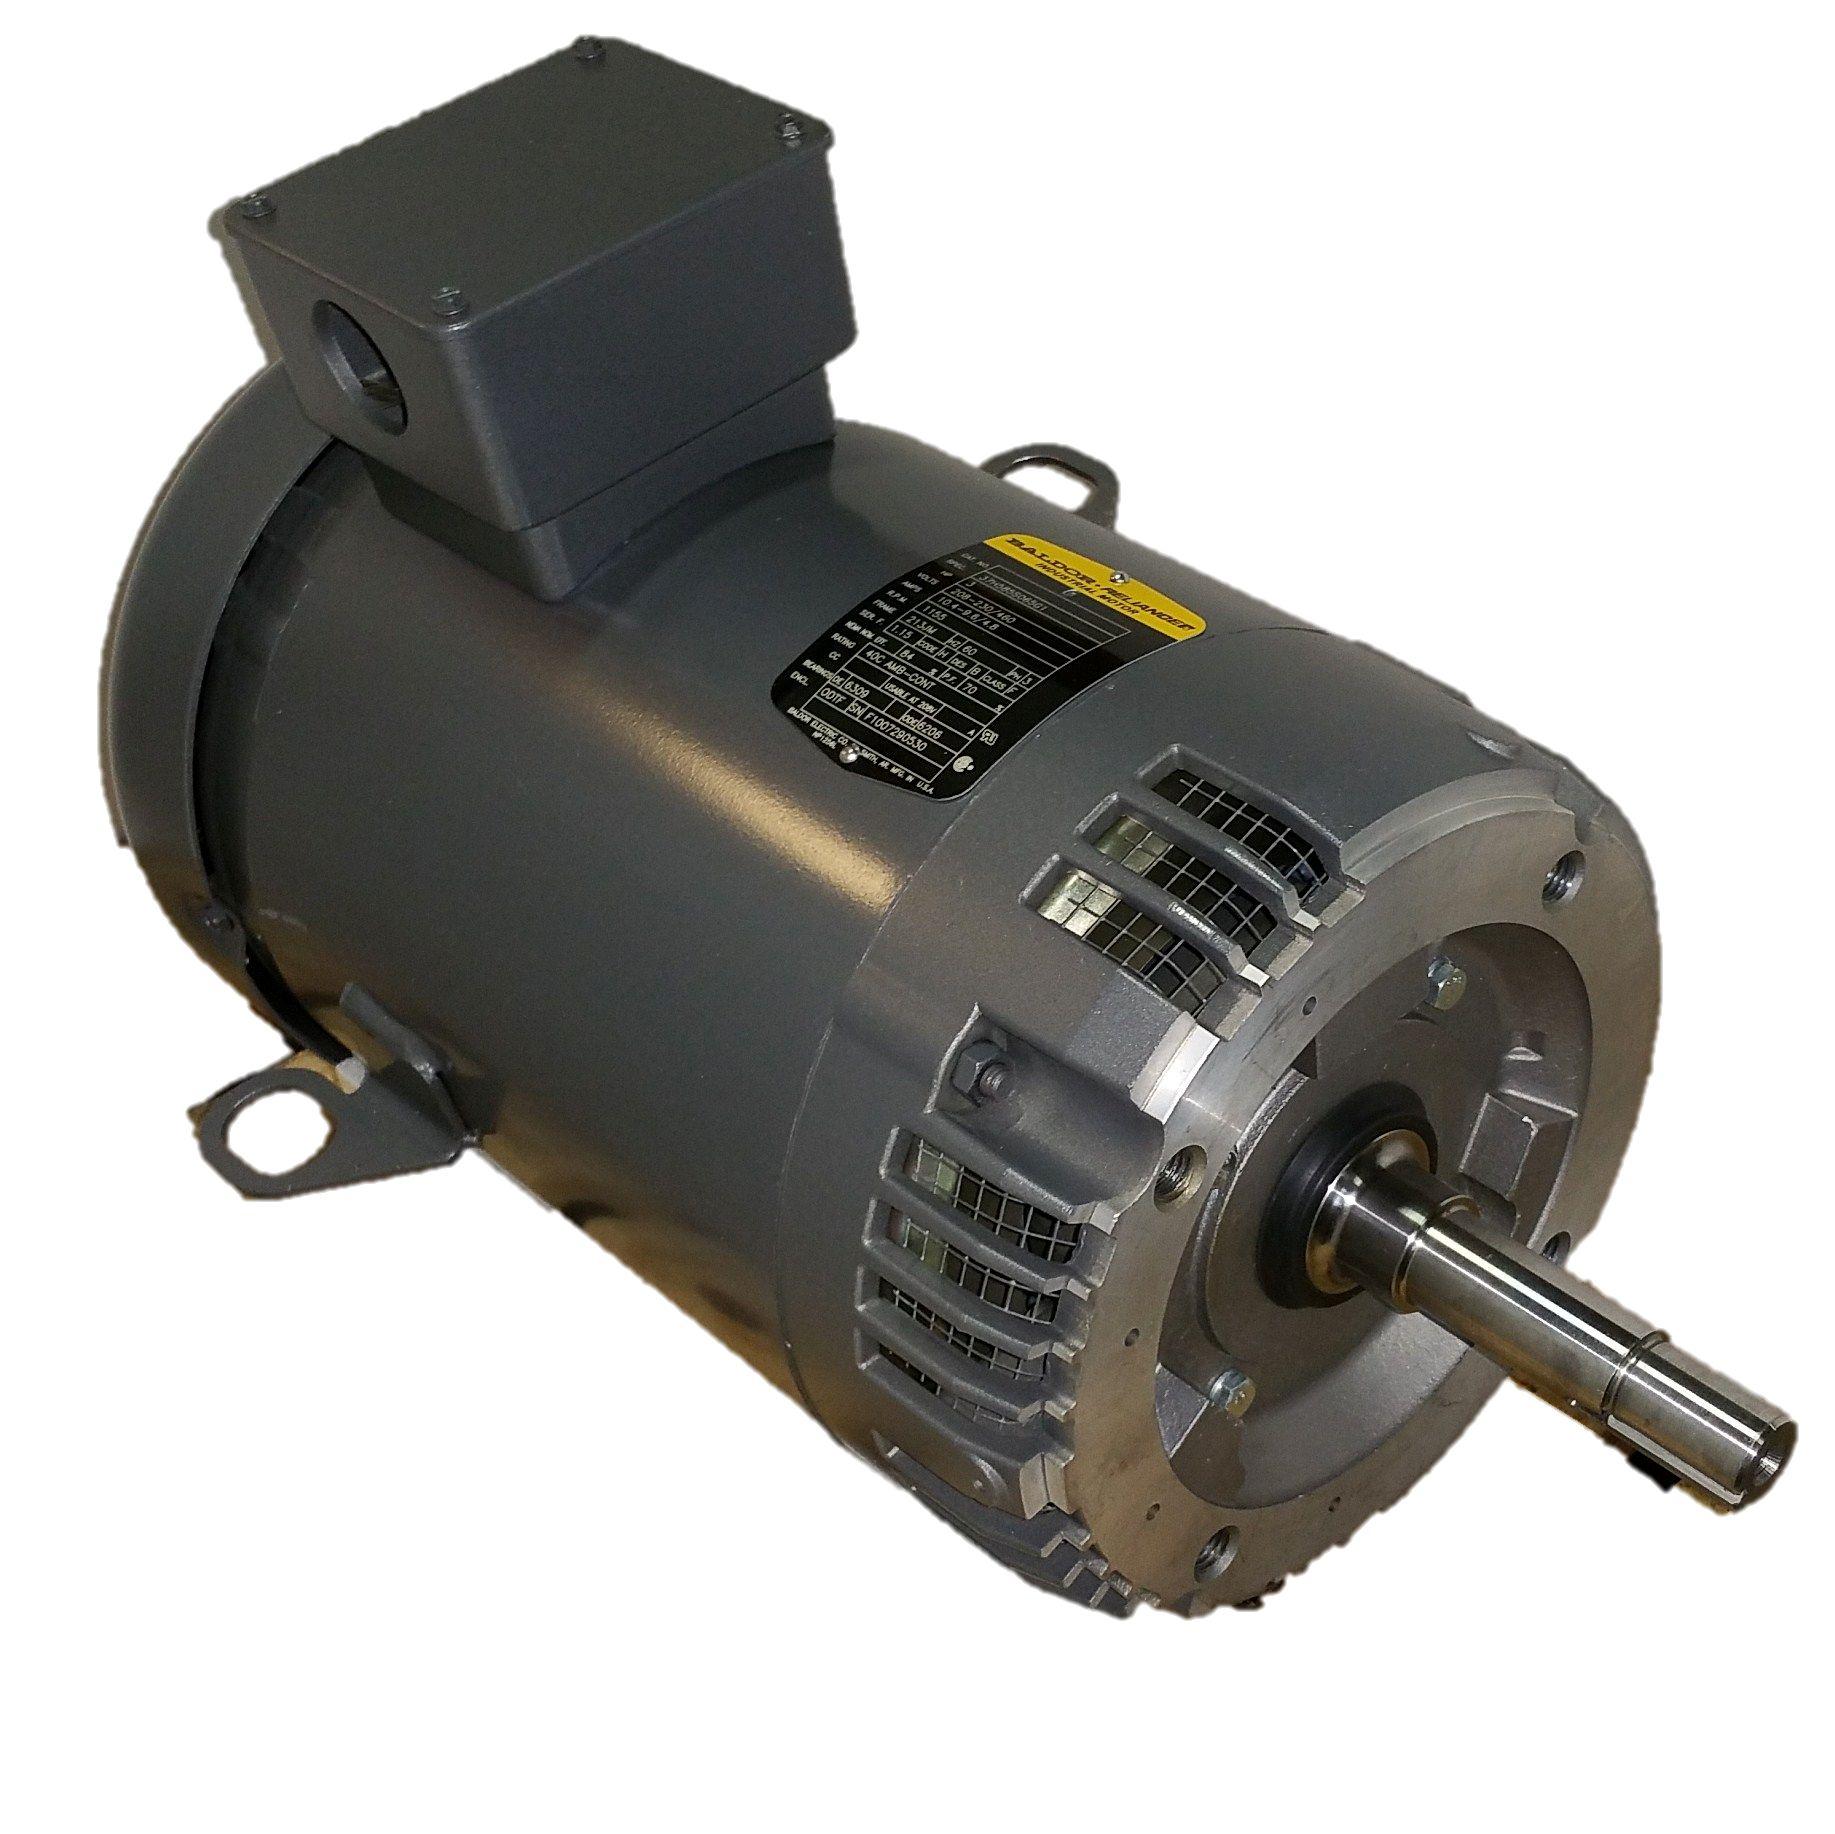 Baldor Electric Motors At Dealers Industrial Equipment